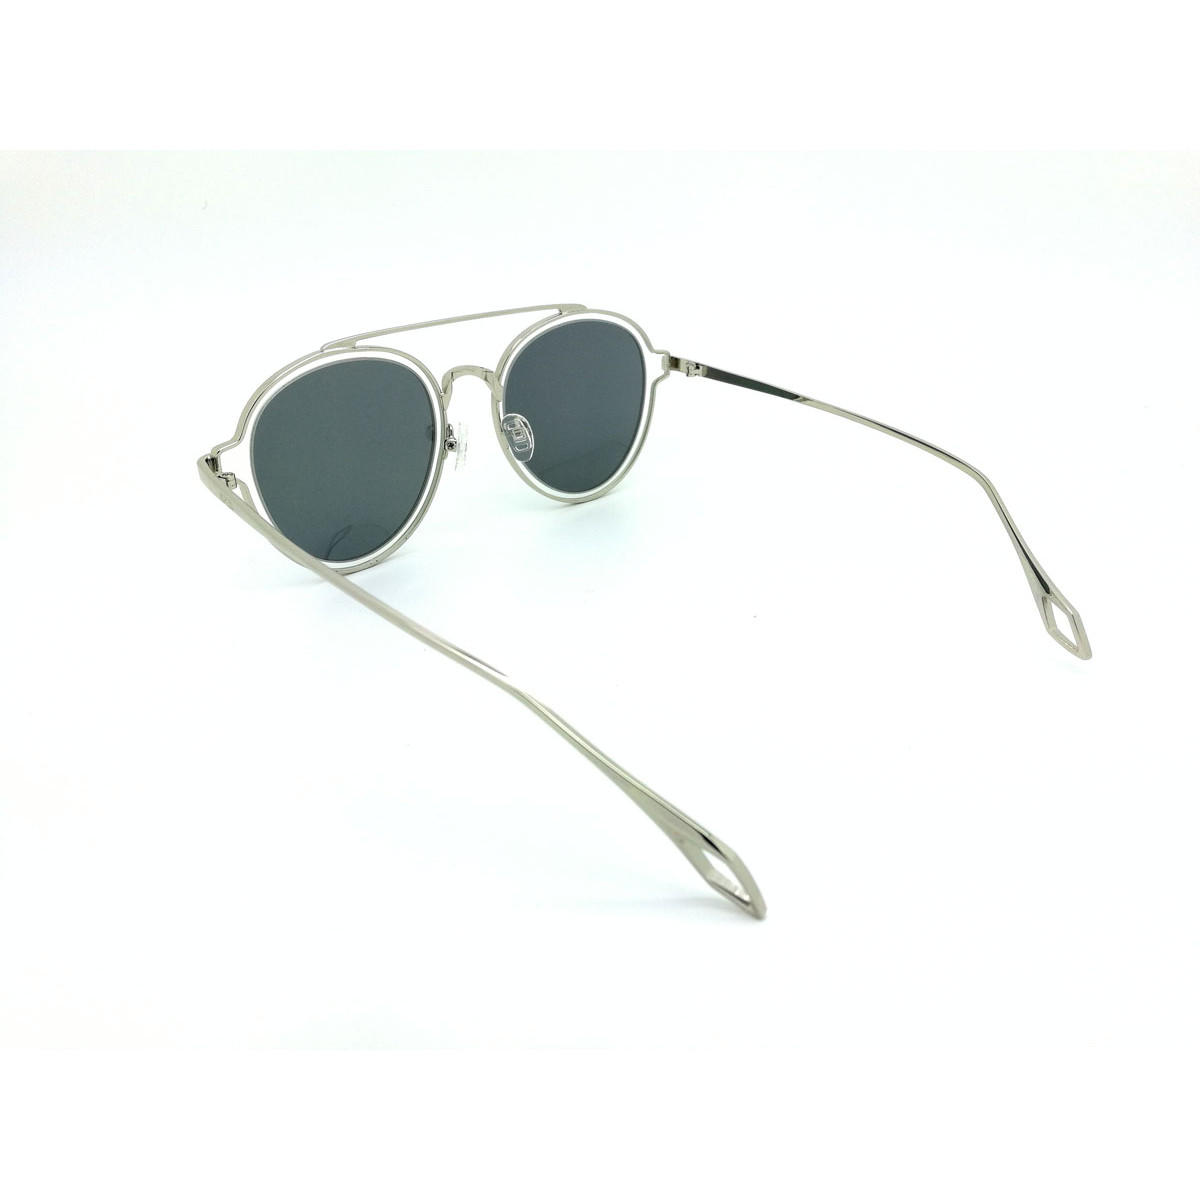 Sonnenbrille Miami | Grau